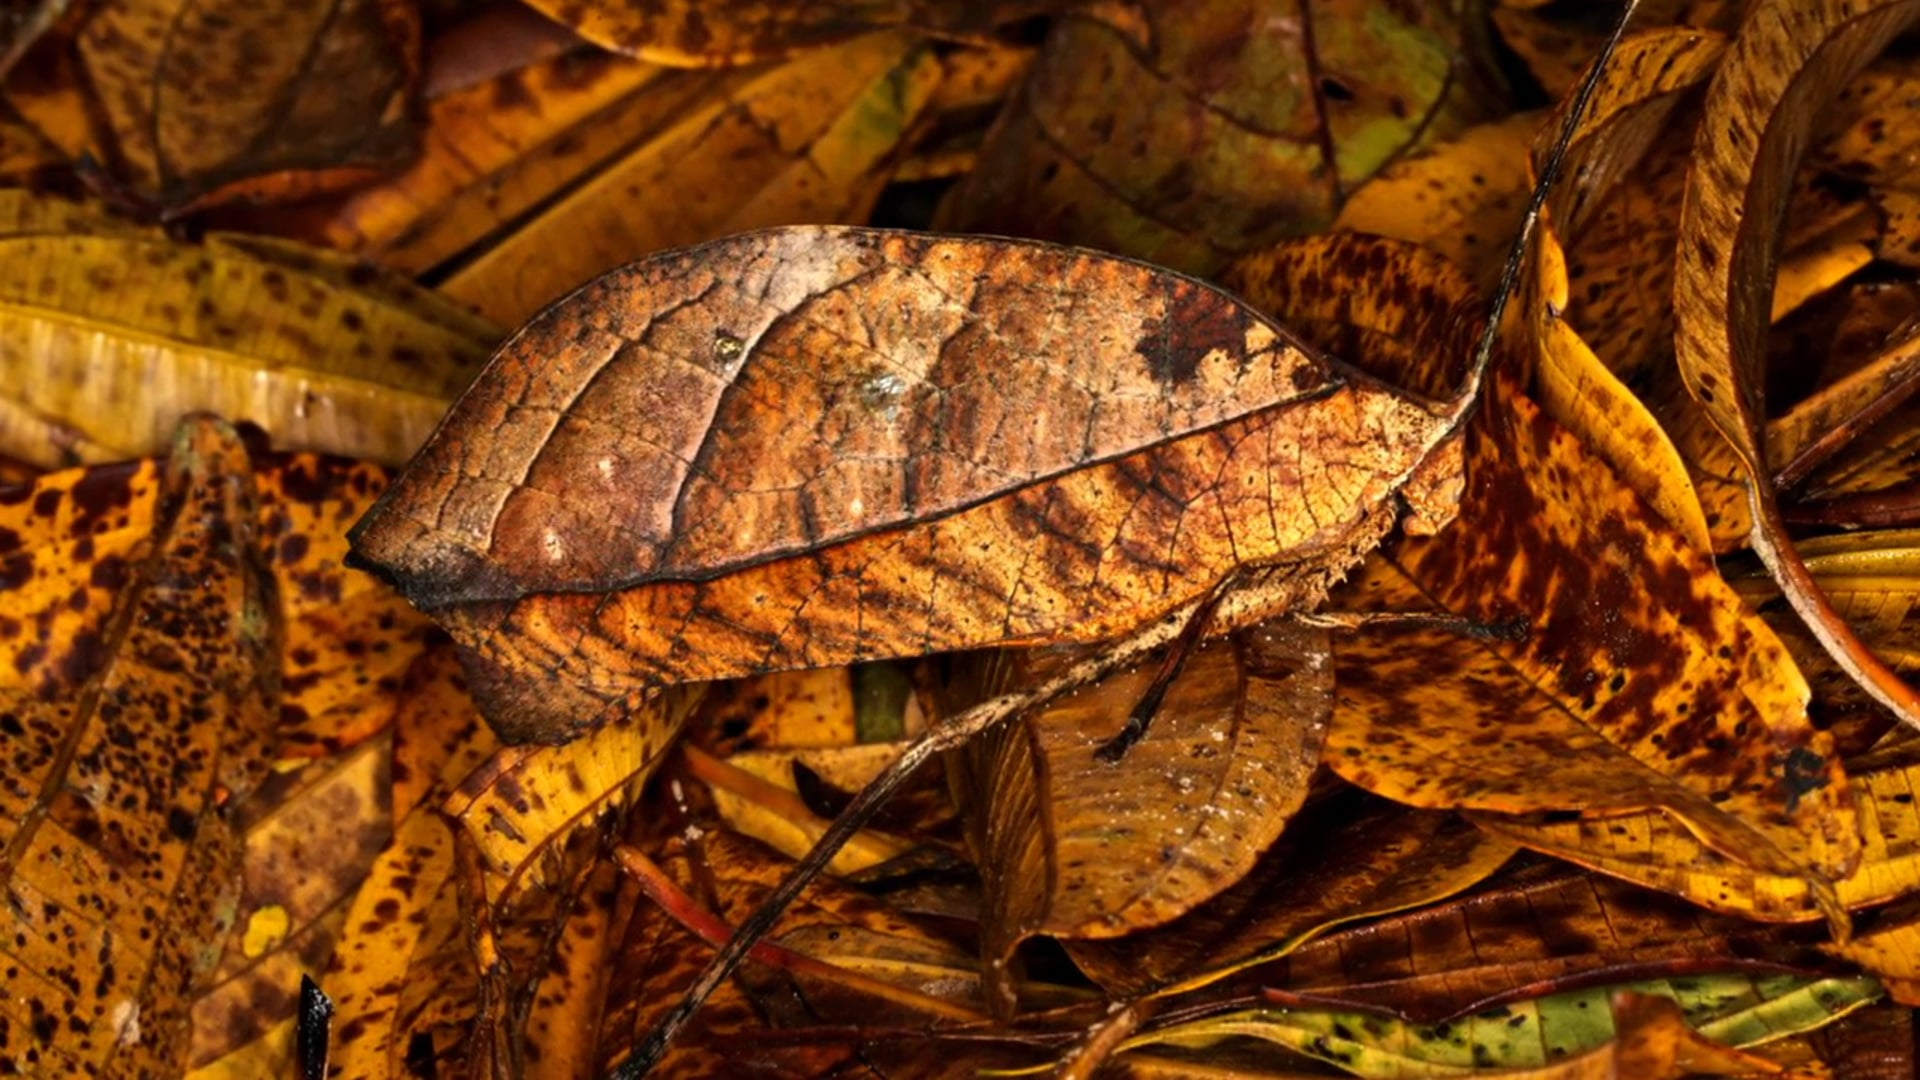 'The Katydid - Masters Of Camouflage'